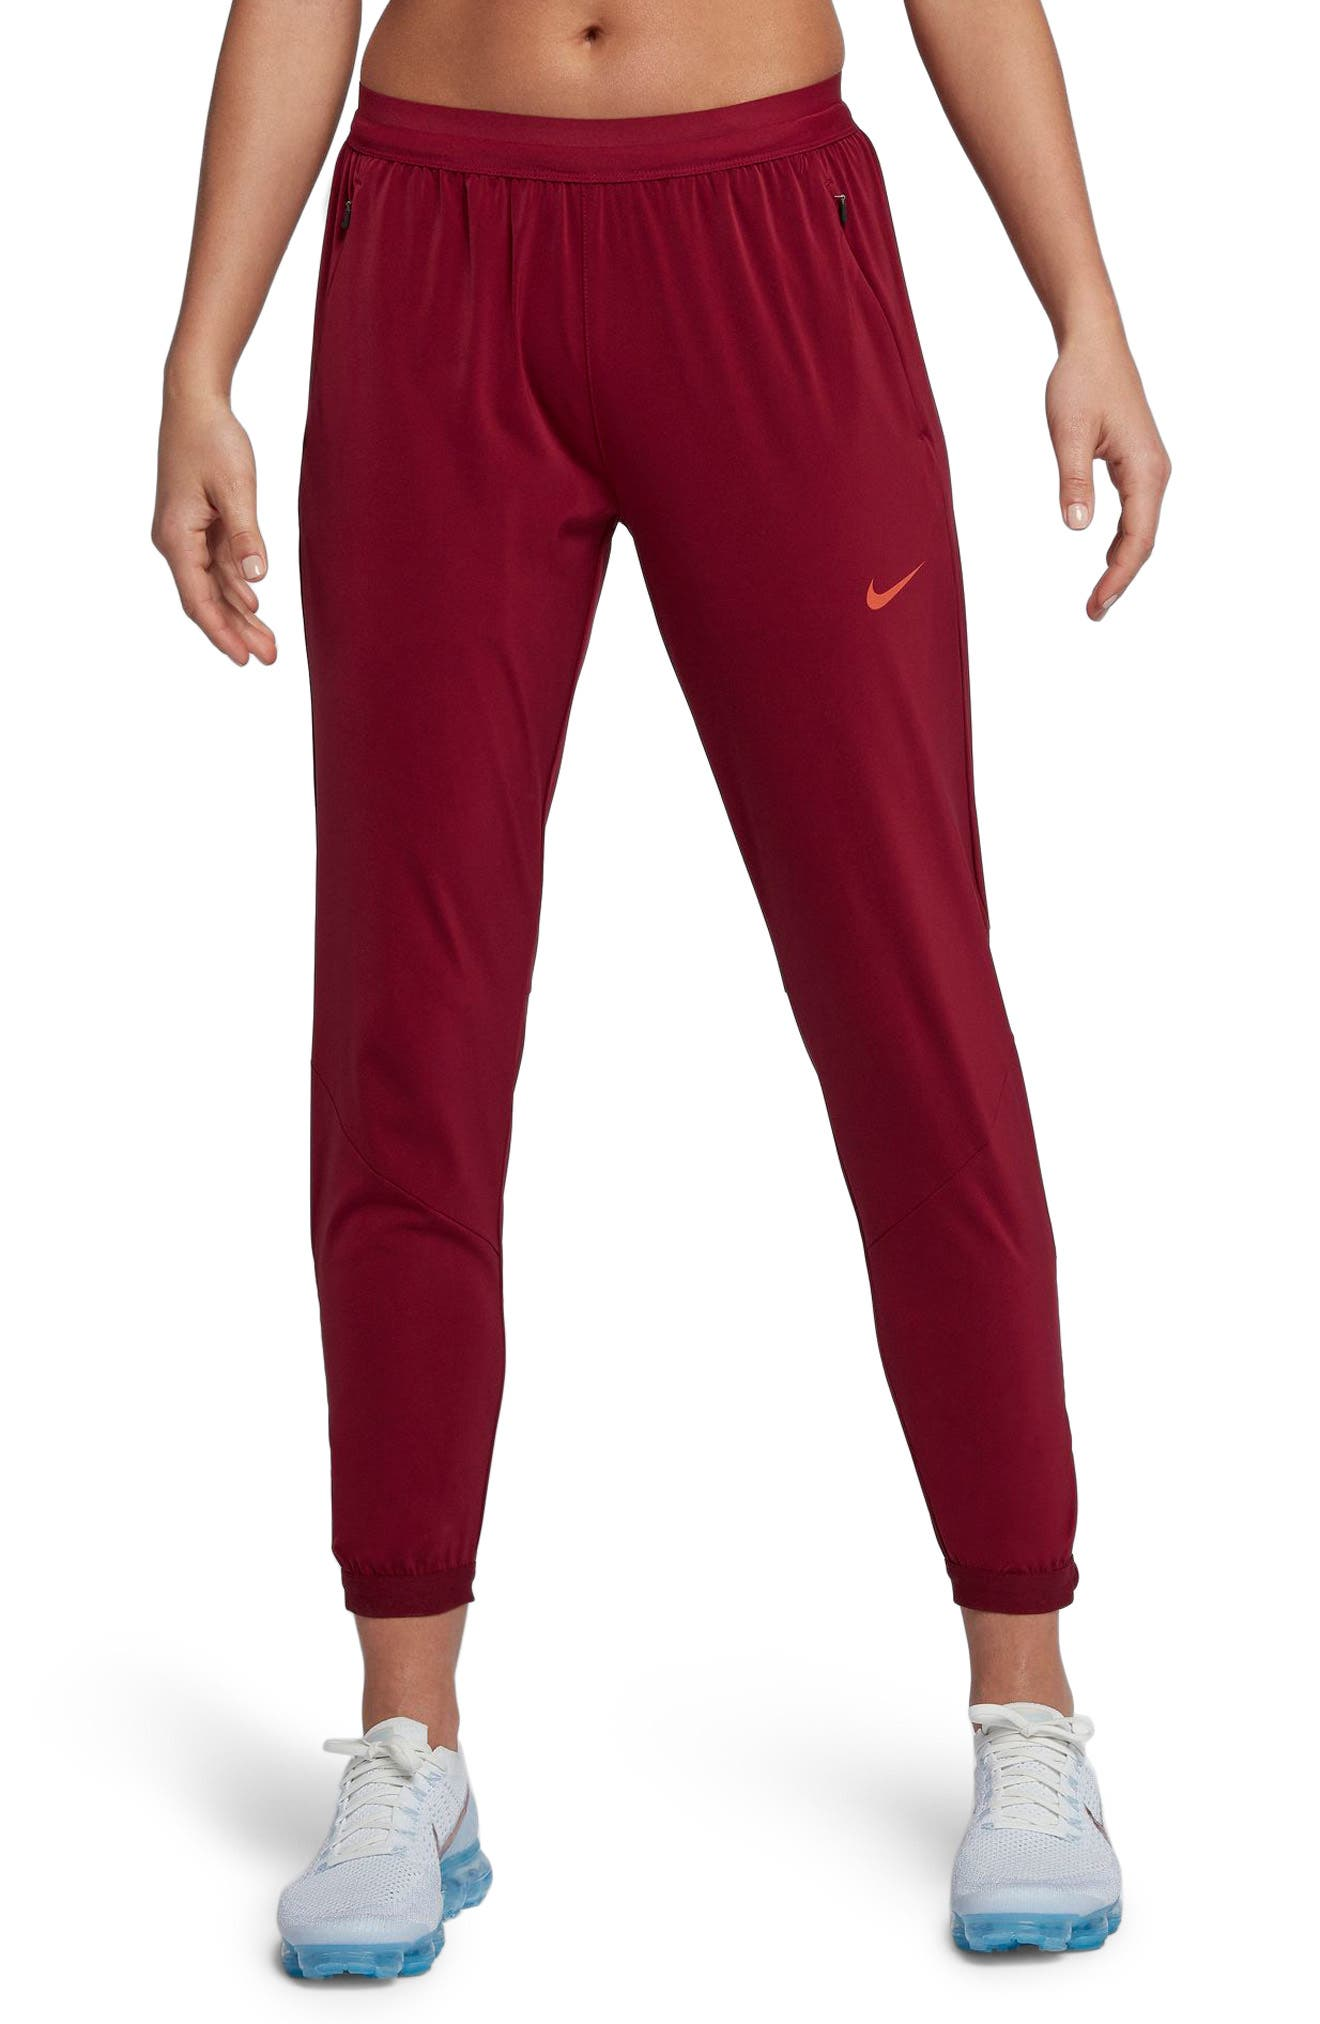 Alternate Image 1 Selected - Nike Women's Dry Running Stadium Pants